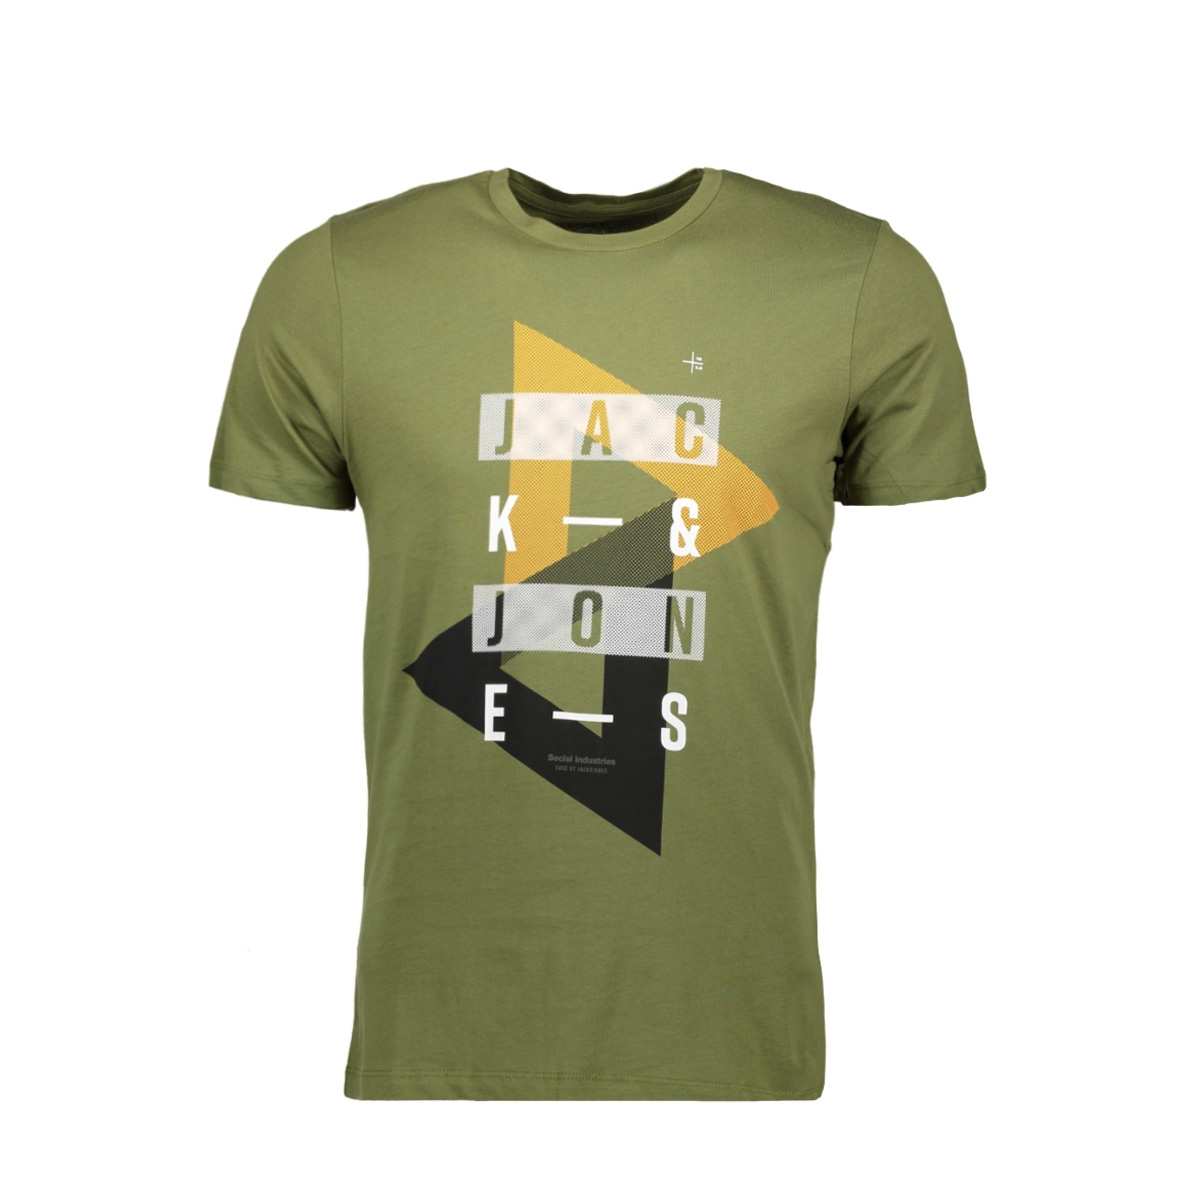 jcobooster tee ss crew neck 0010 12135945 jack & jones t-shirt capulet olive